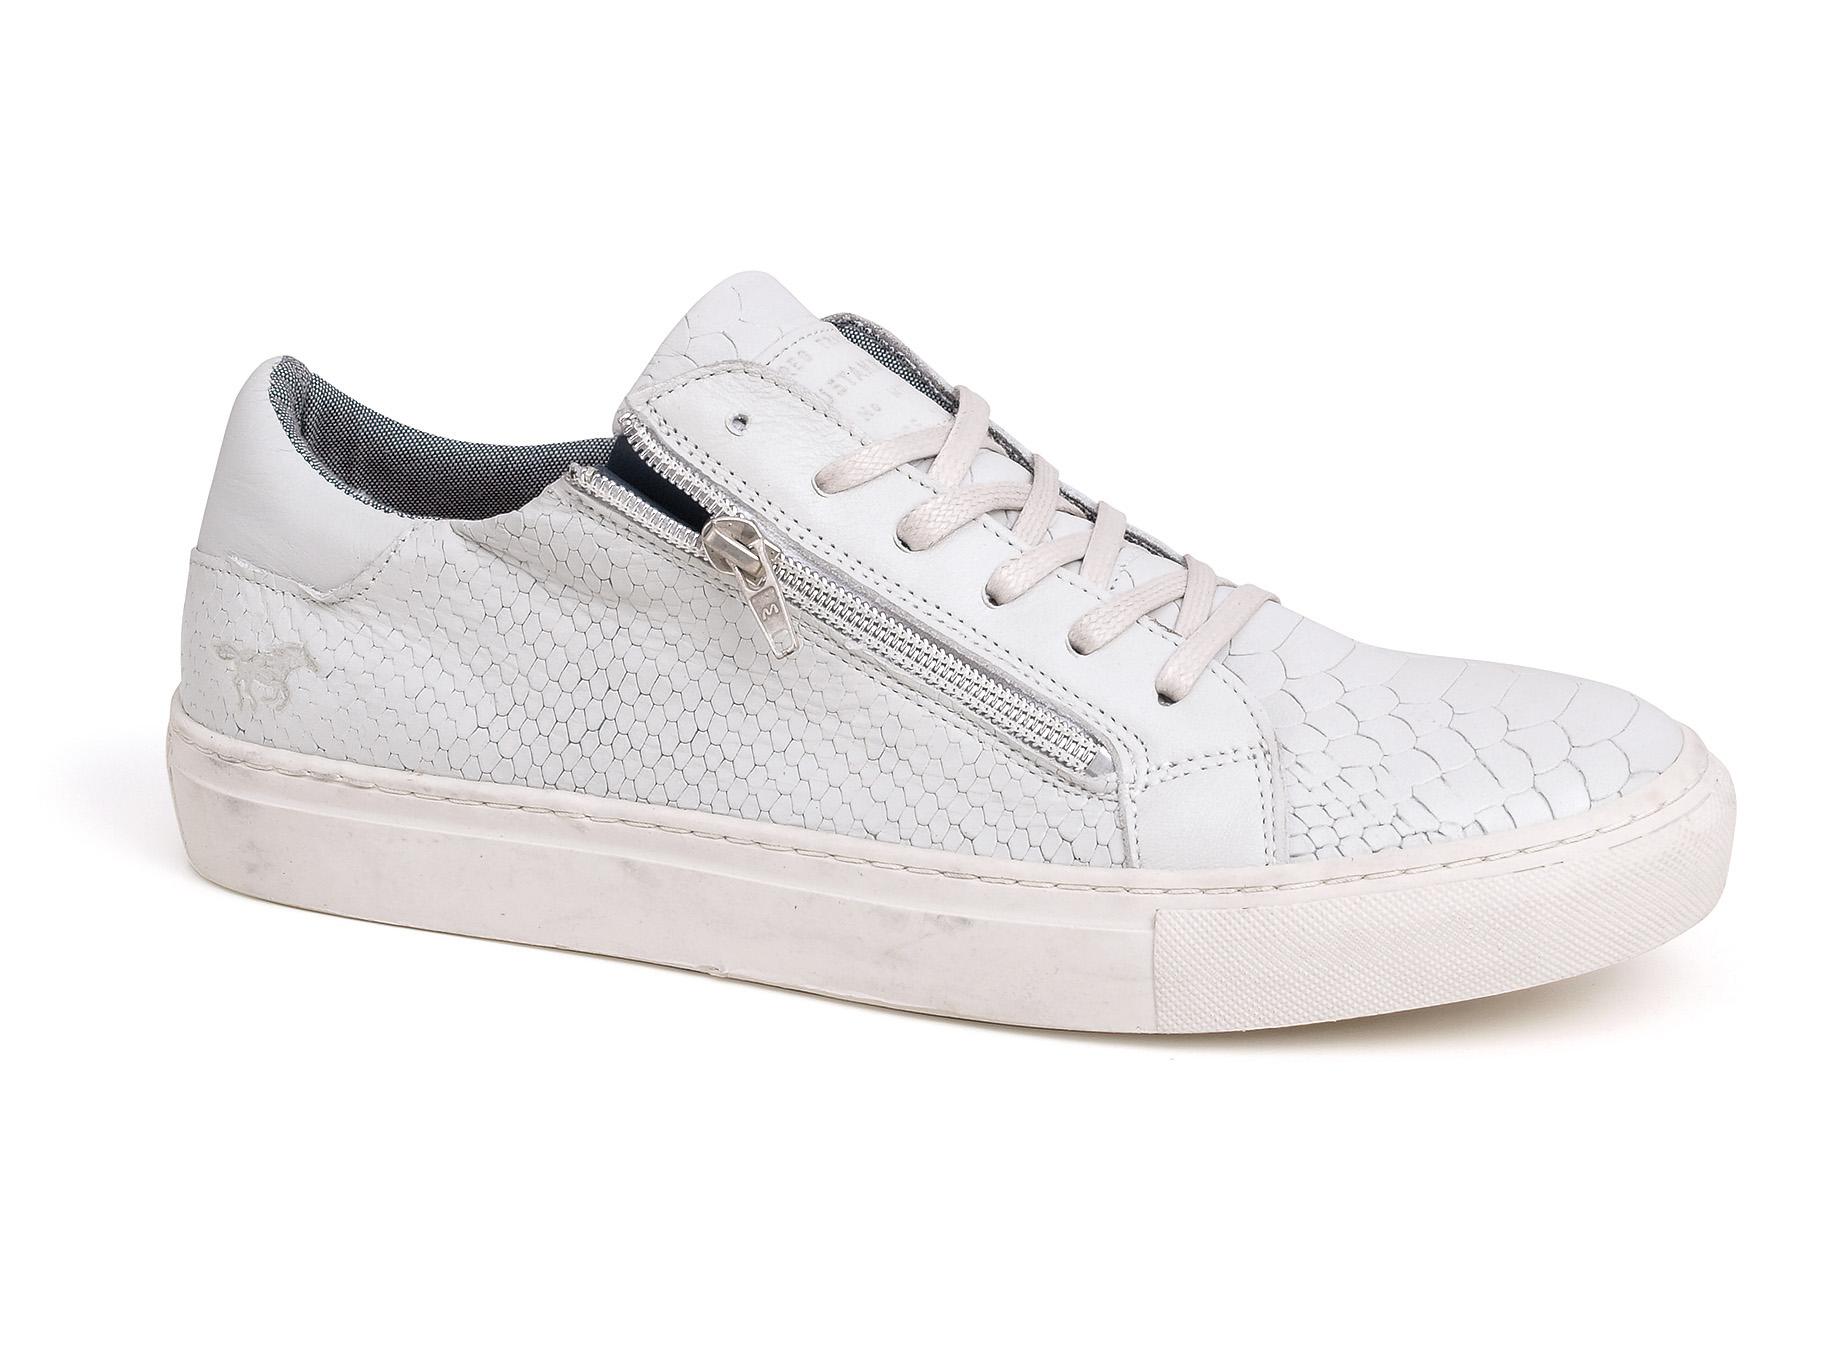 819551e184d80 Buty skórzane męskie MUSTANG shoes 36A-011 mustang shoes